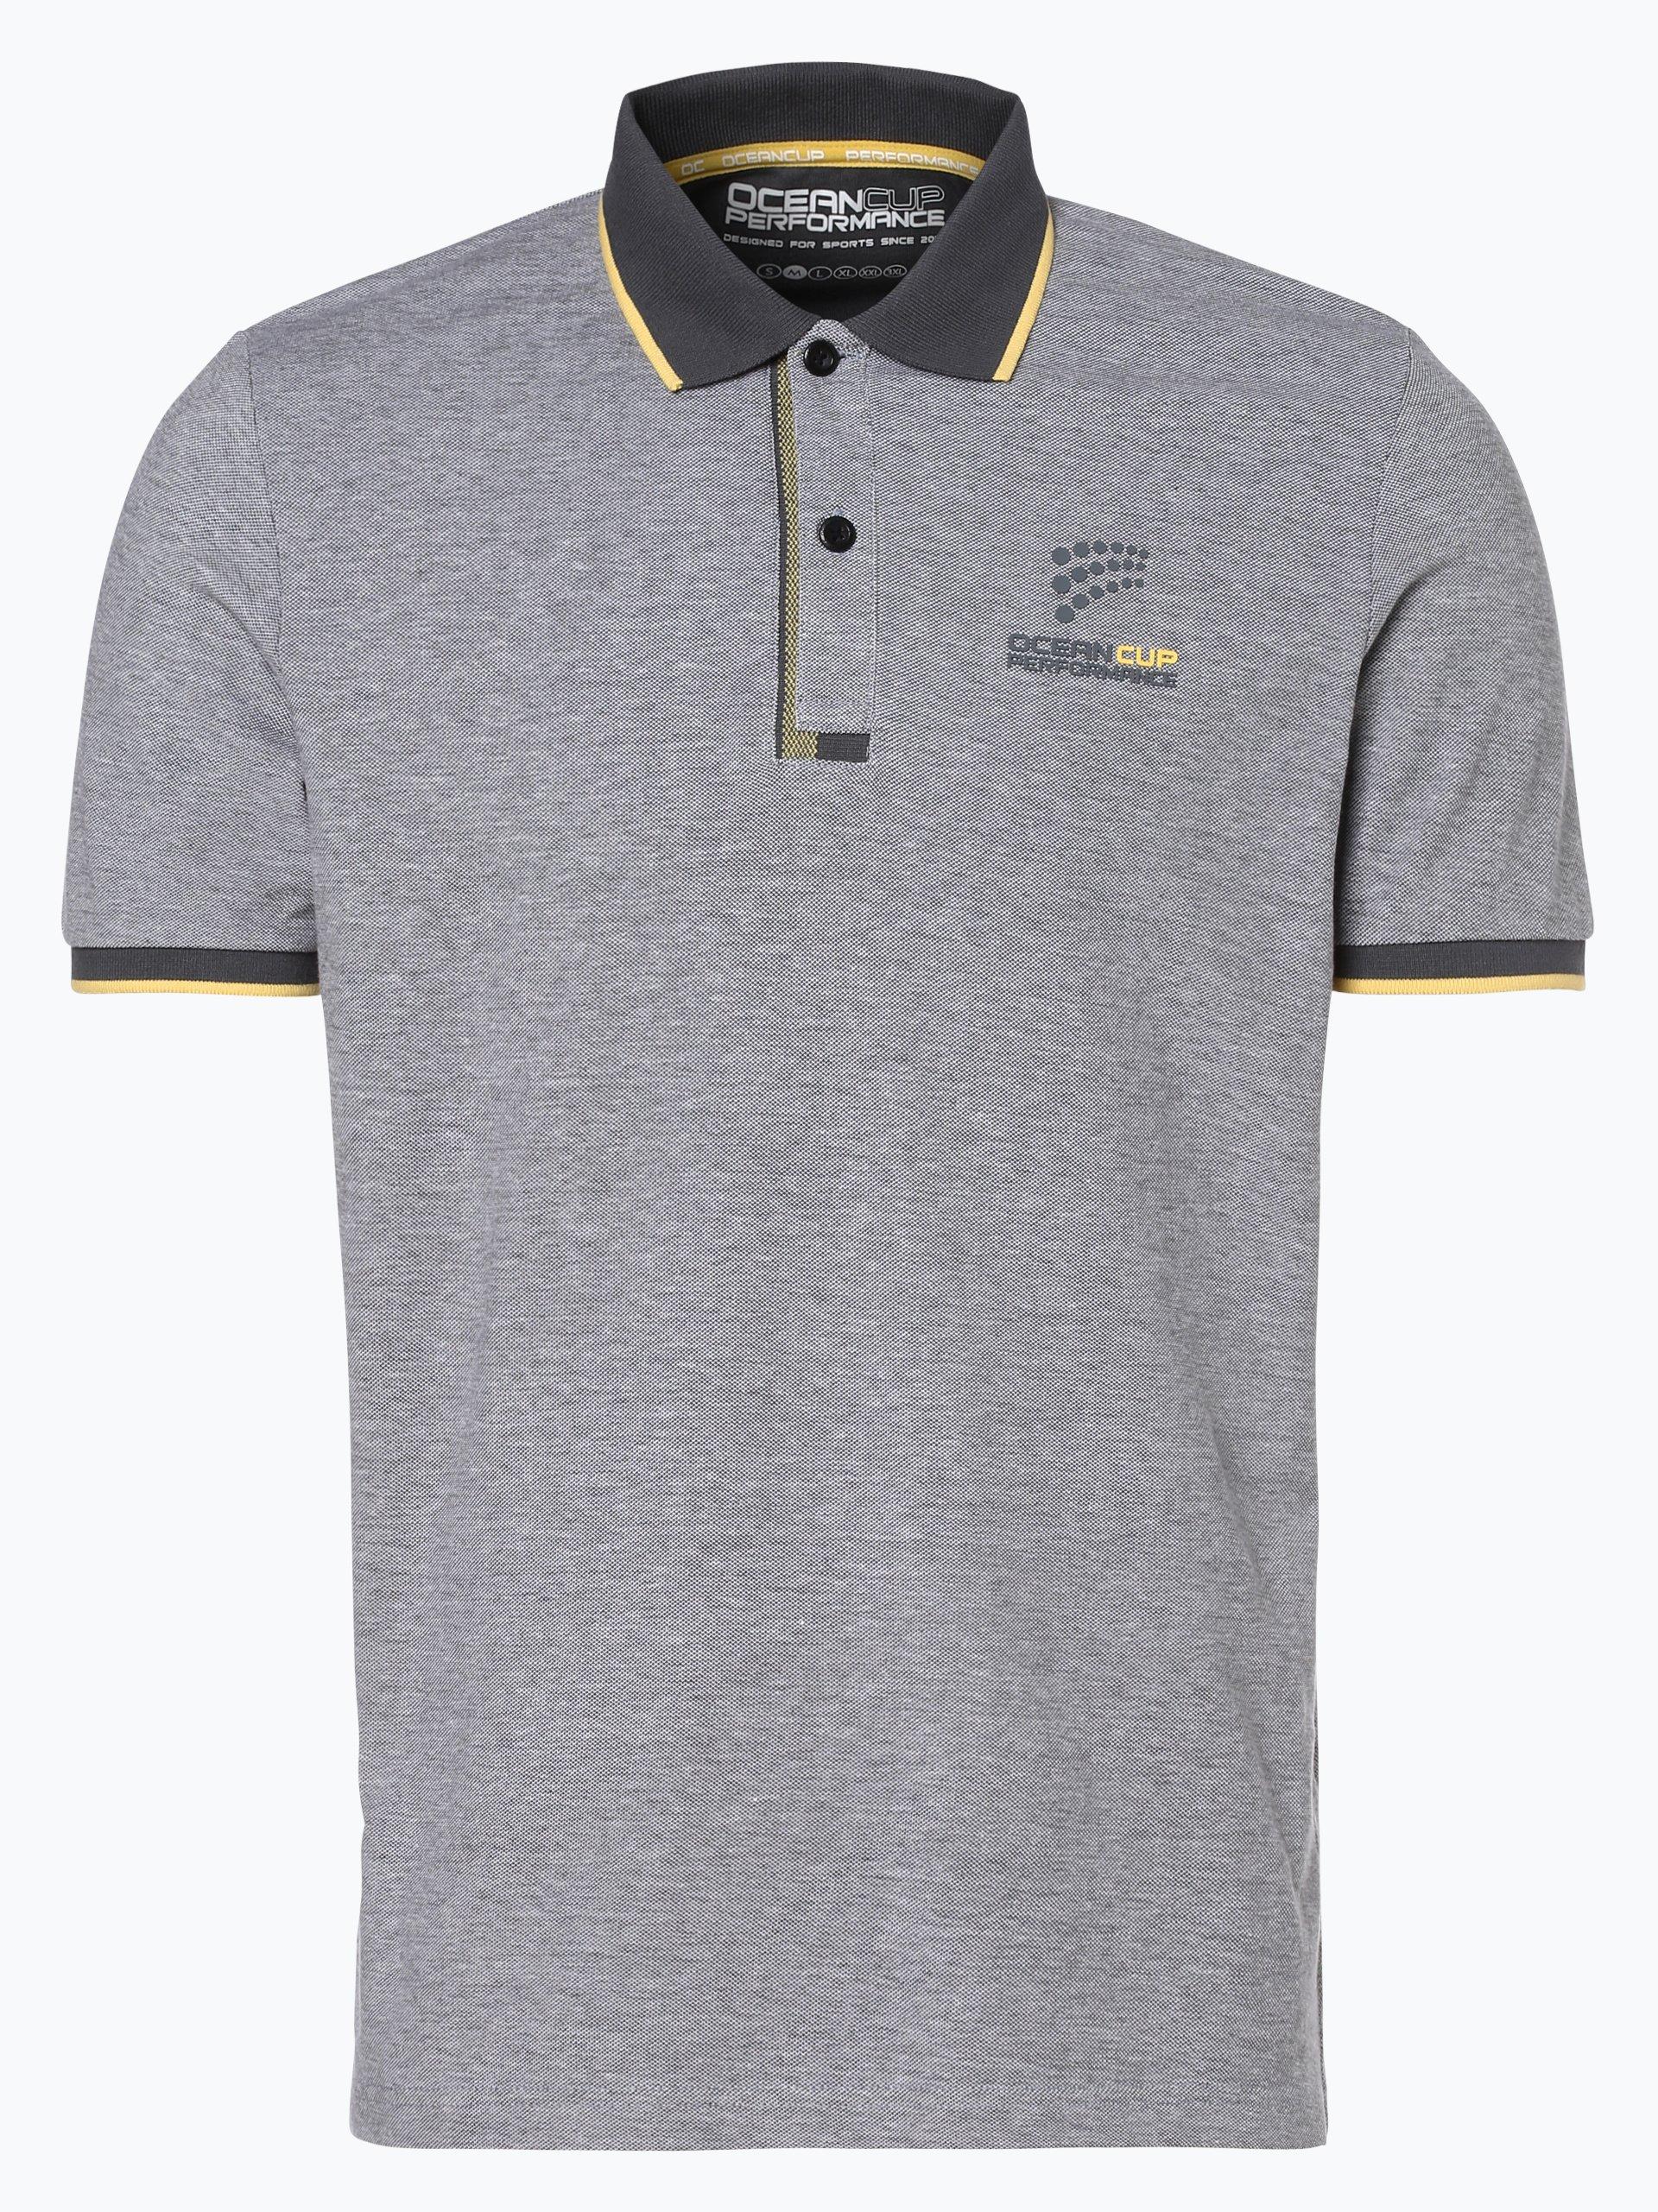 competitive price 9ecf4 38666 Ocean Cup Herren Poloshirt online kaufen   PEEK-UND ...